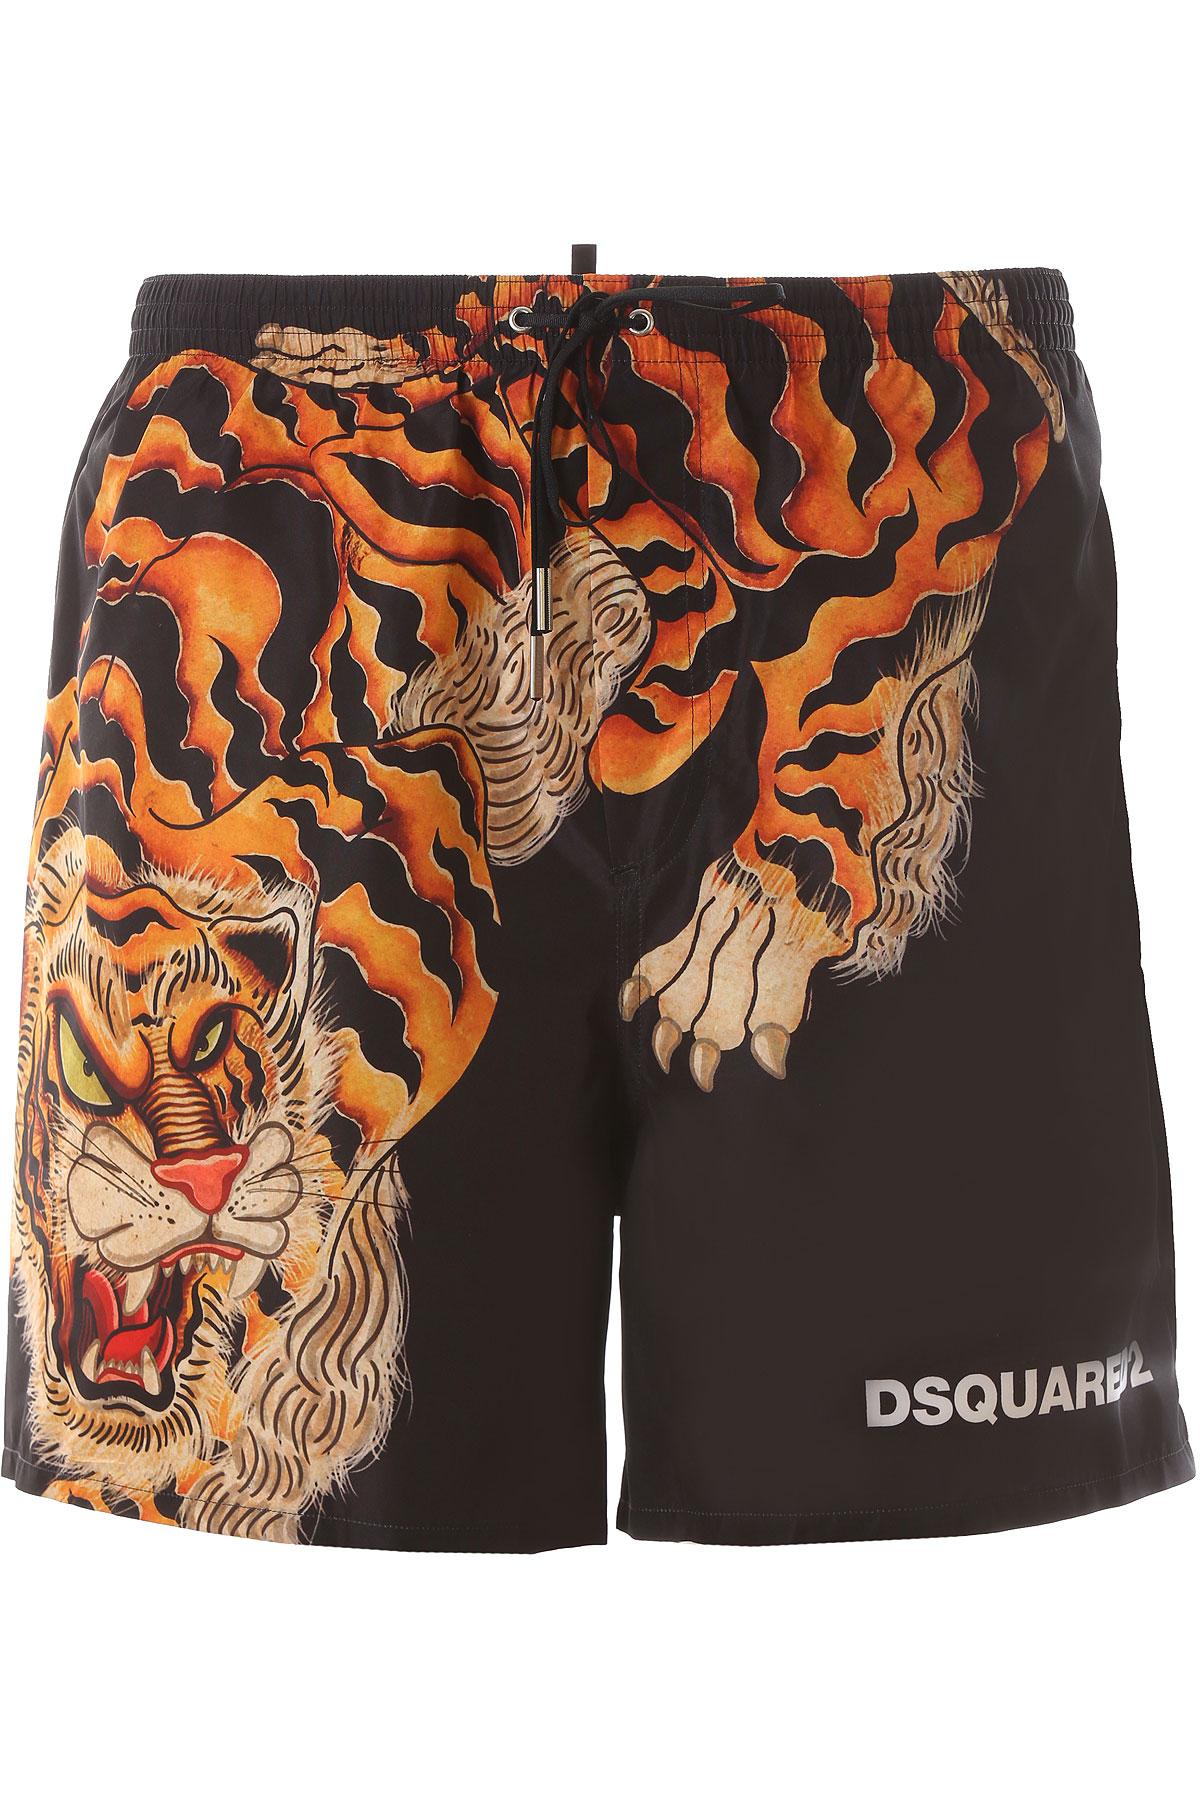 Dsquared2 Board Shorts for Men On Sale, Black, polyester, 2019, S (EU 46) M (EU 48) L (EU 50) XL (EU 52)